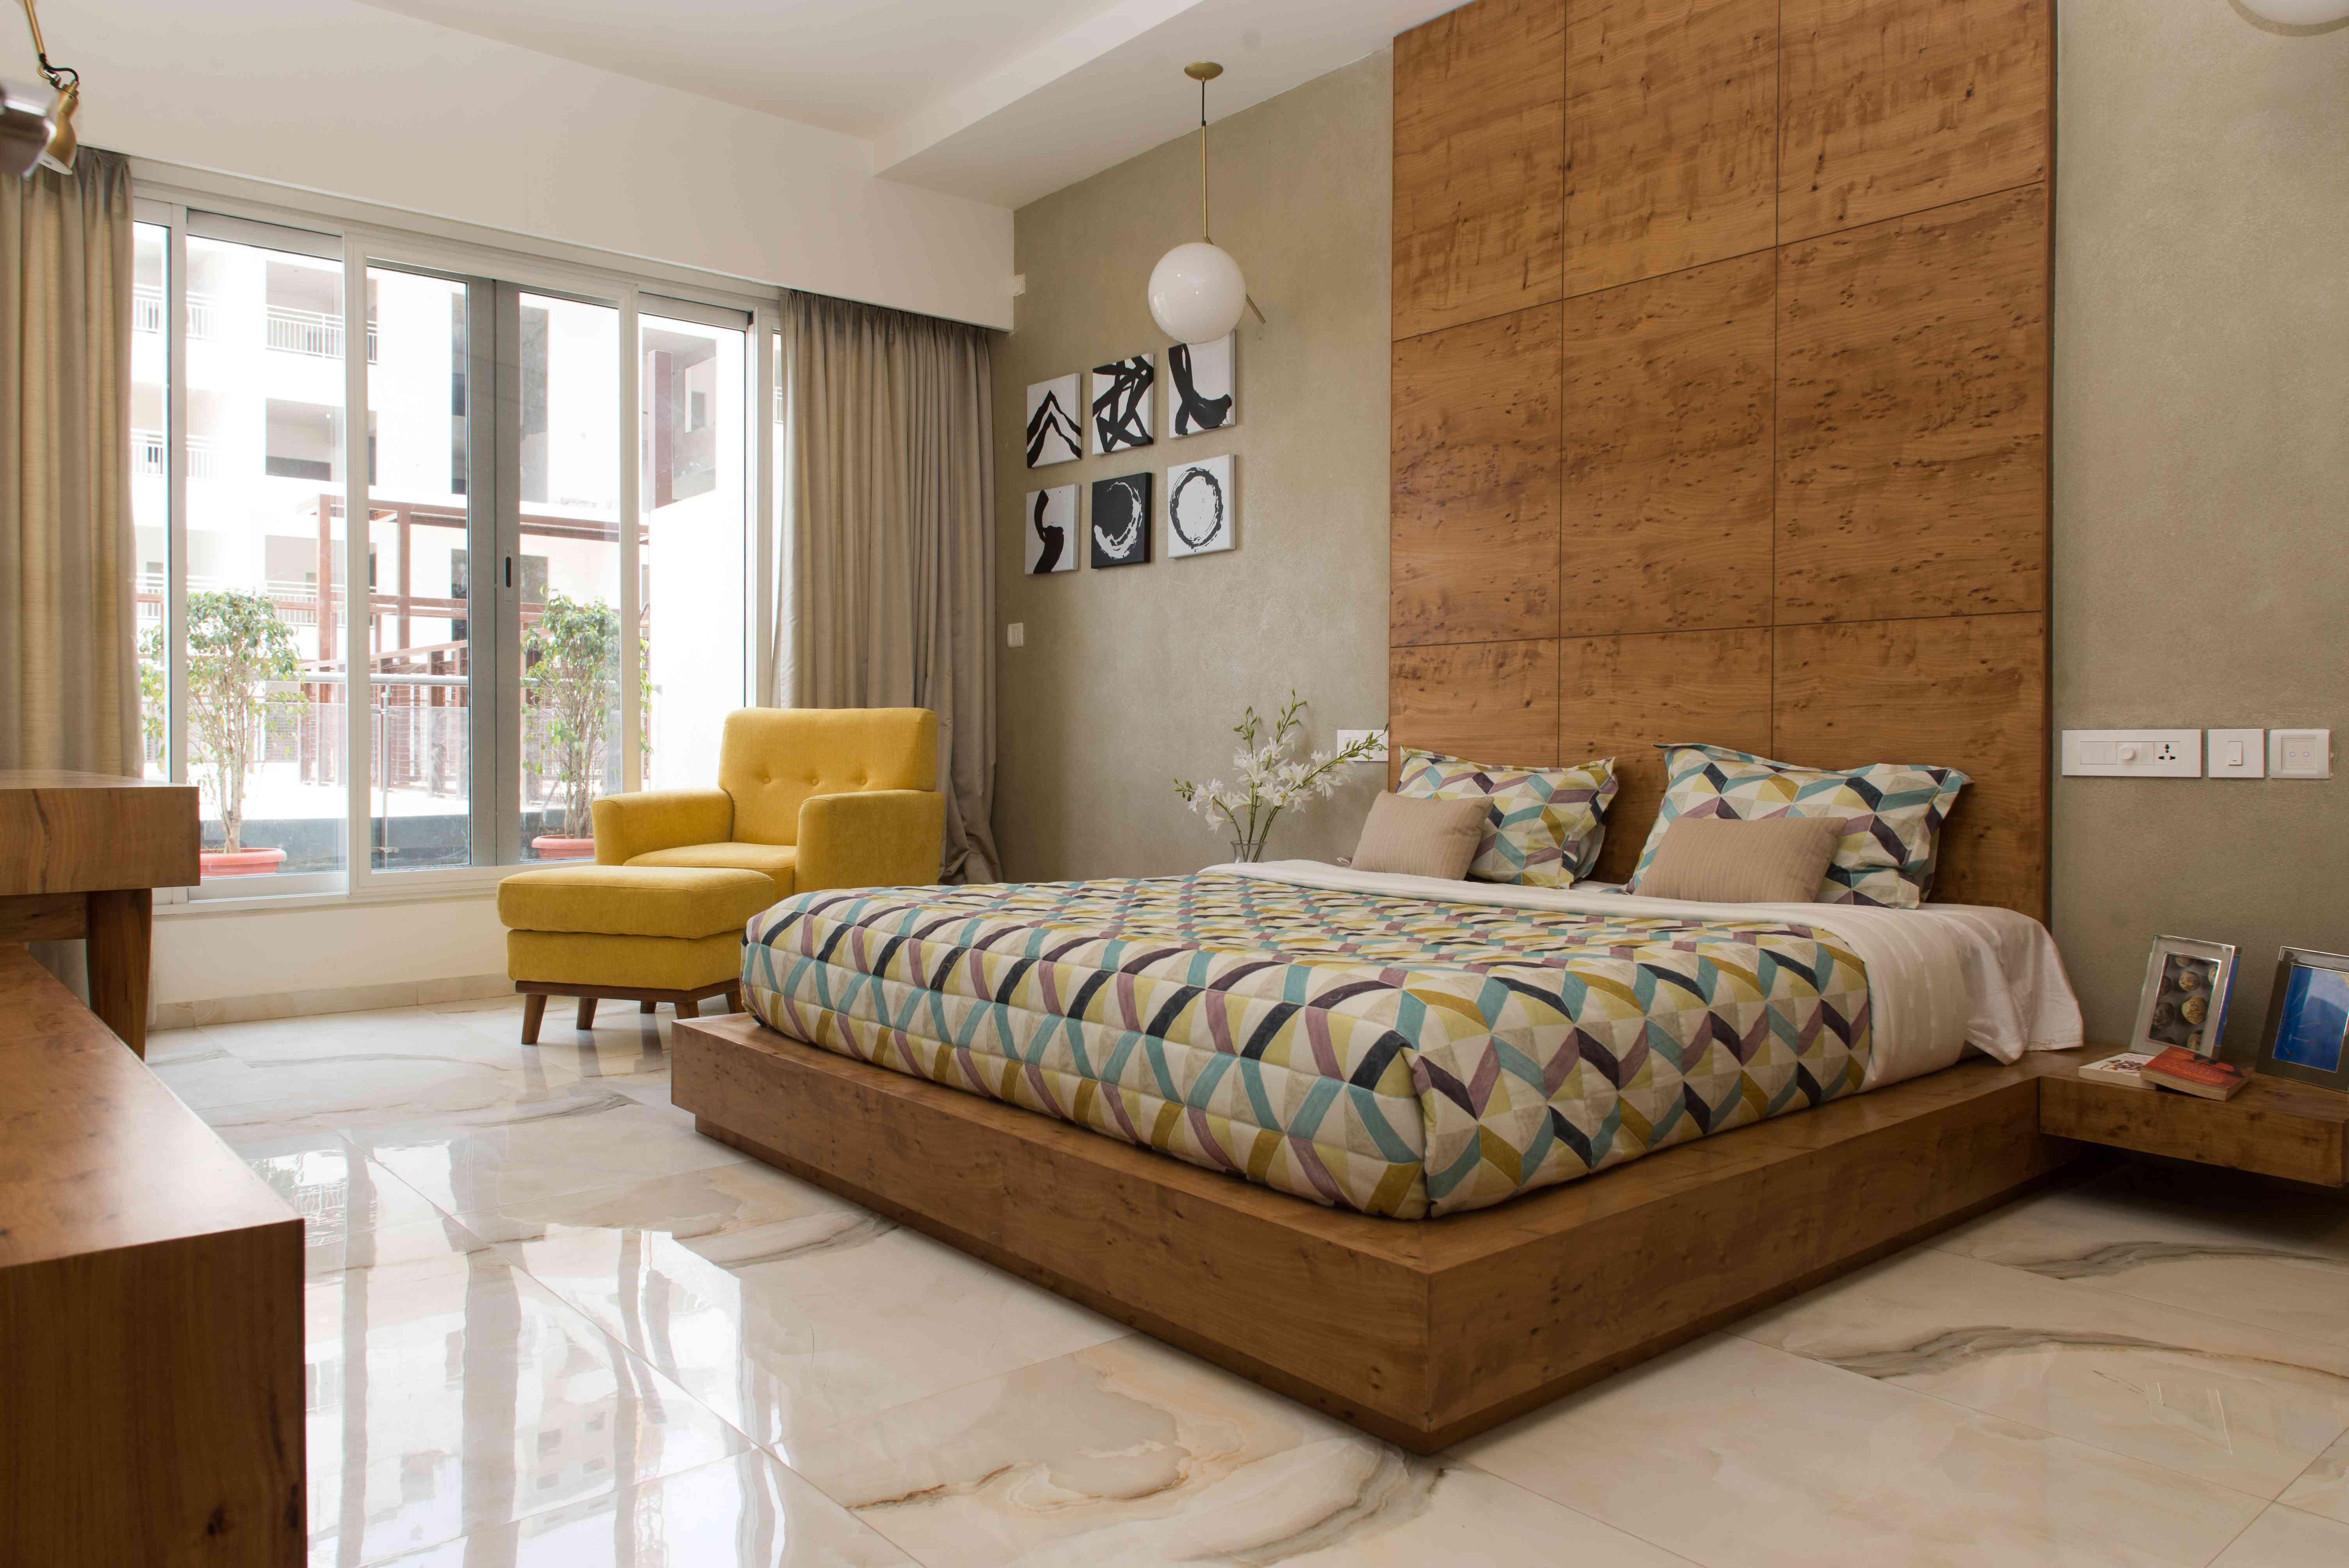 Design By Atom Interiors Modern Style Bedroom Master Bedroom Interior House Interior